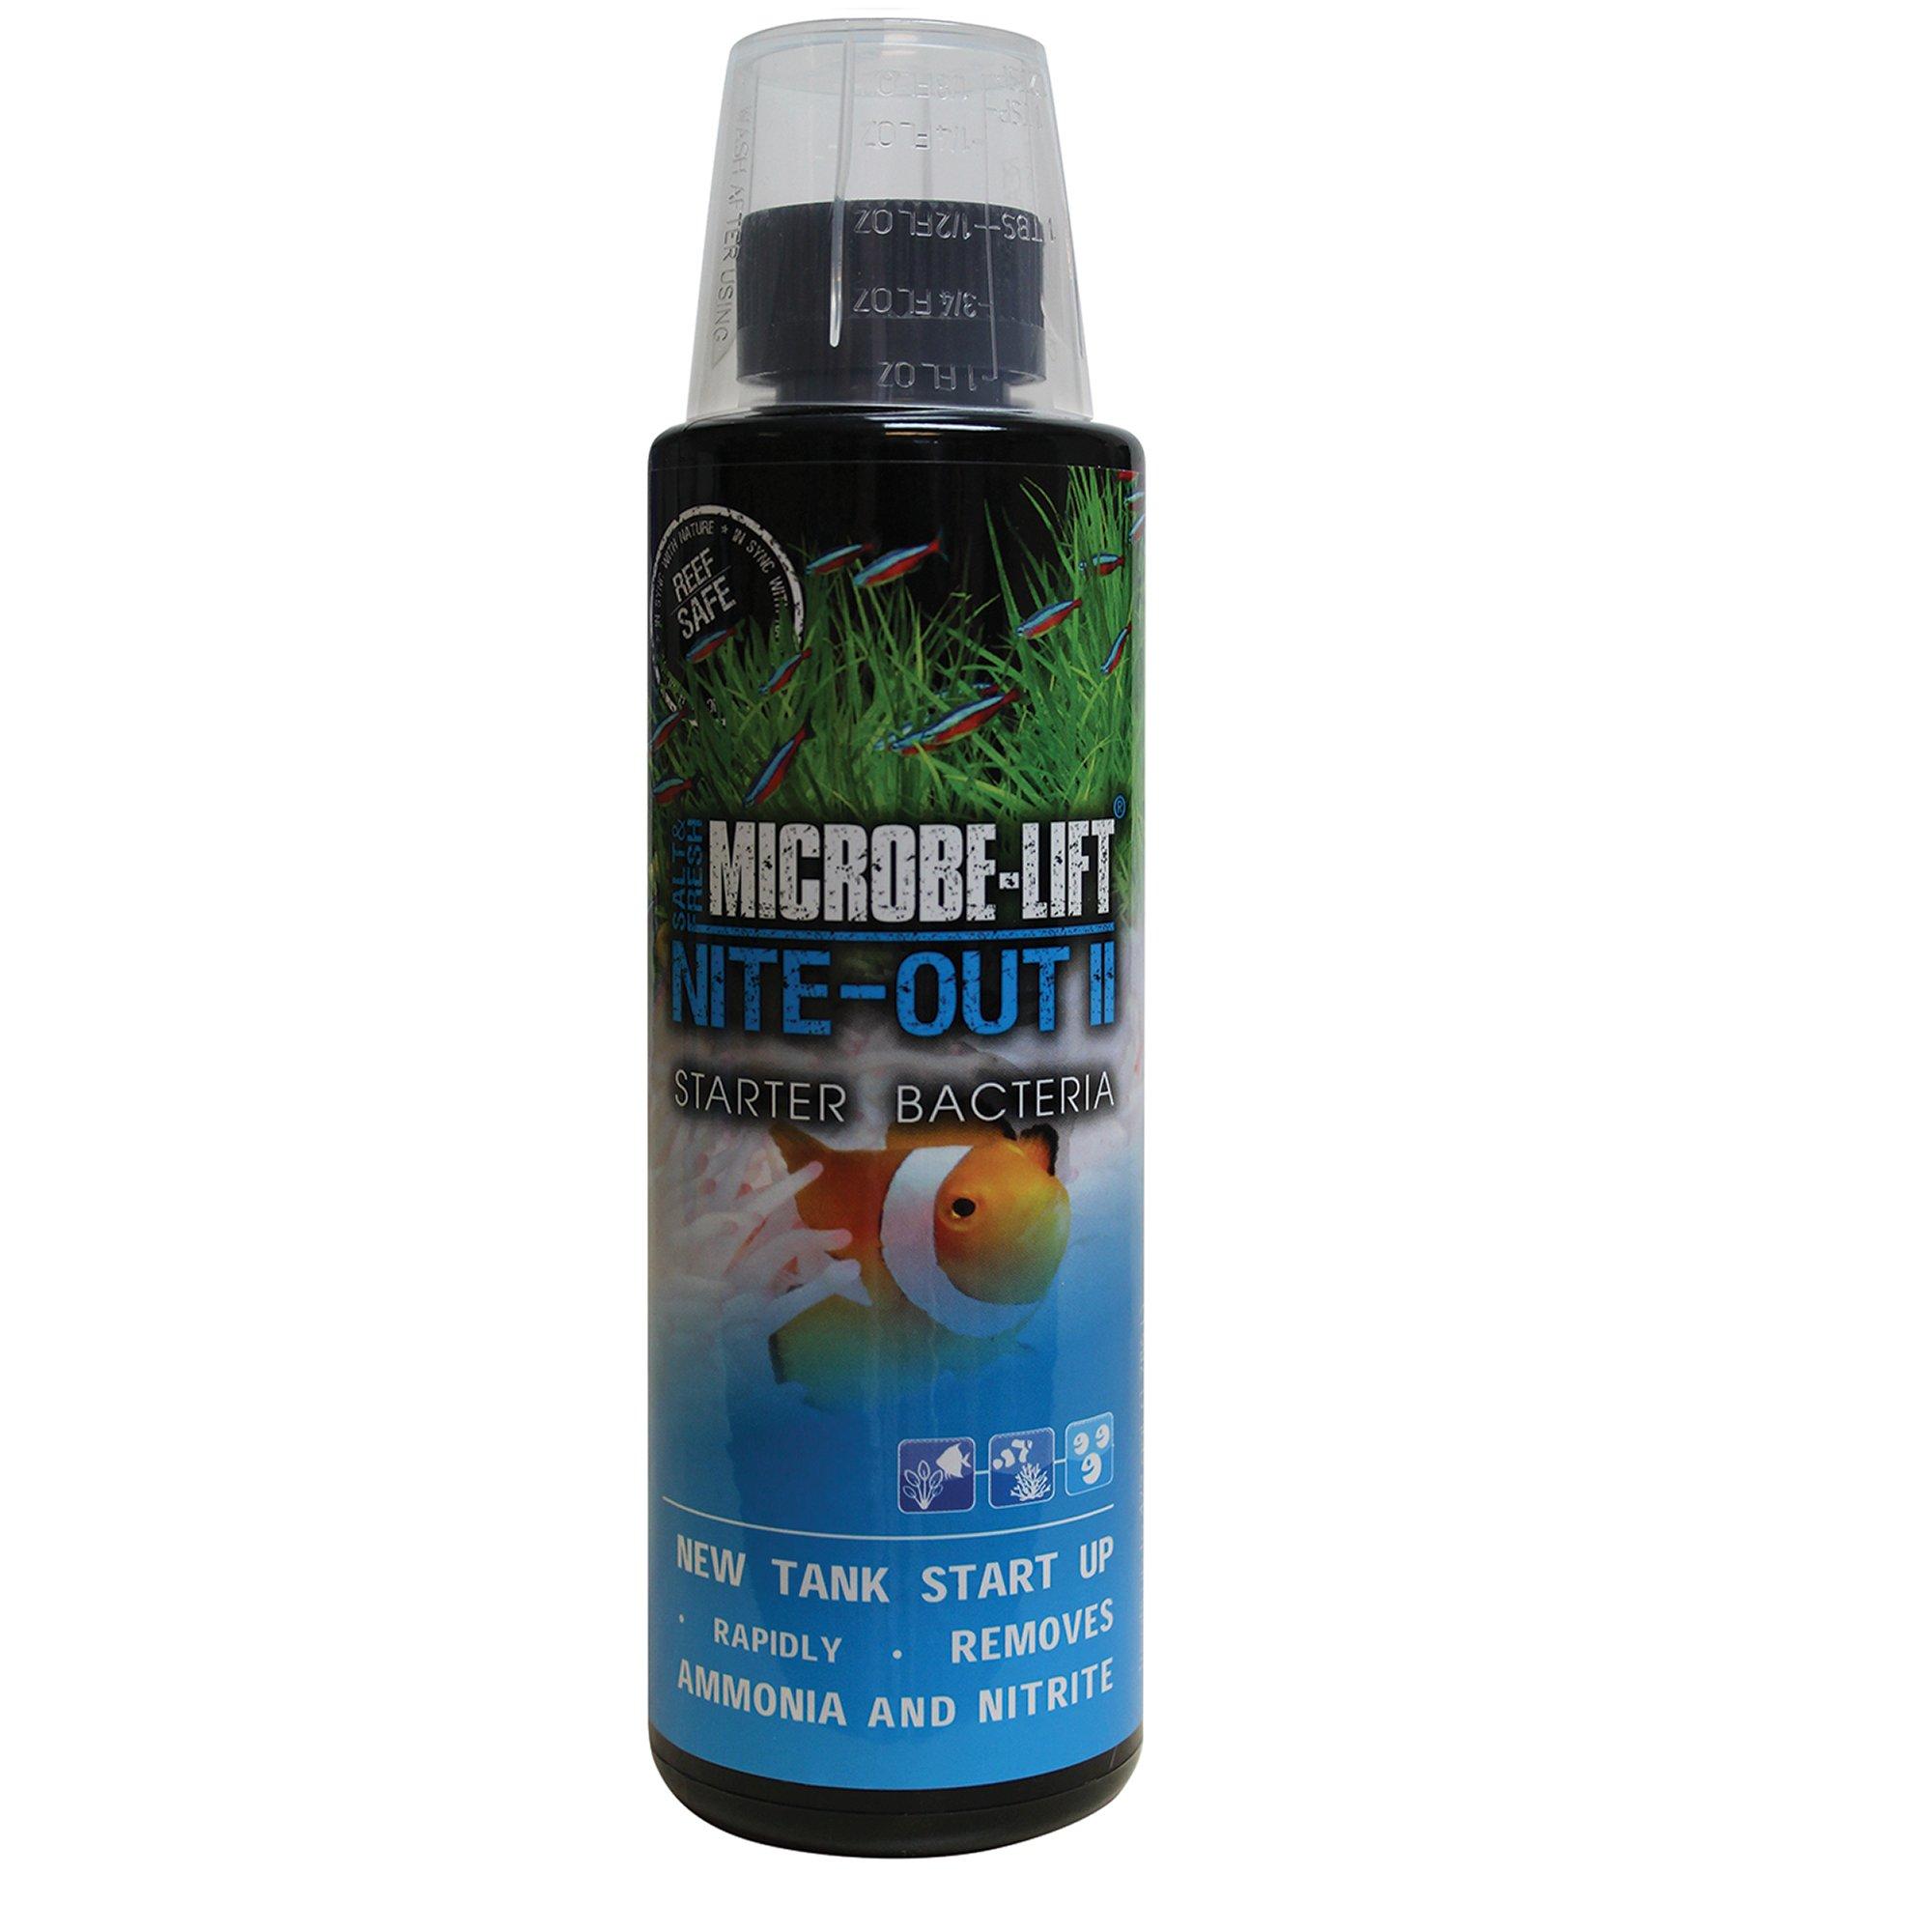 Image of Microbe-Lift Nite Out II, 4 FZ